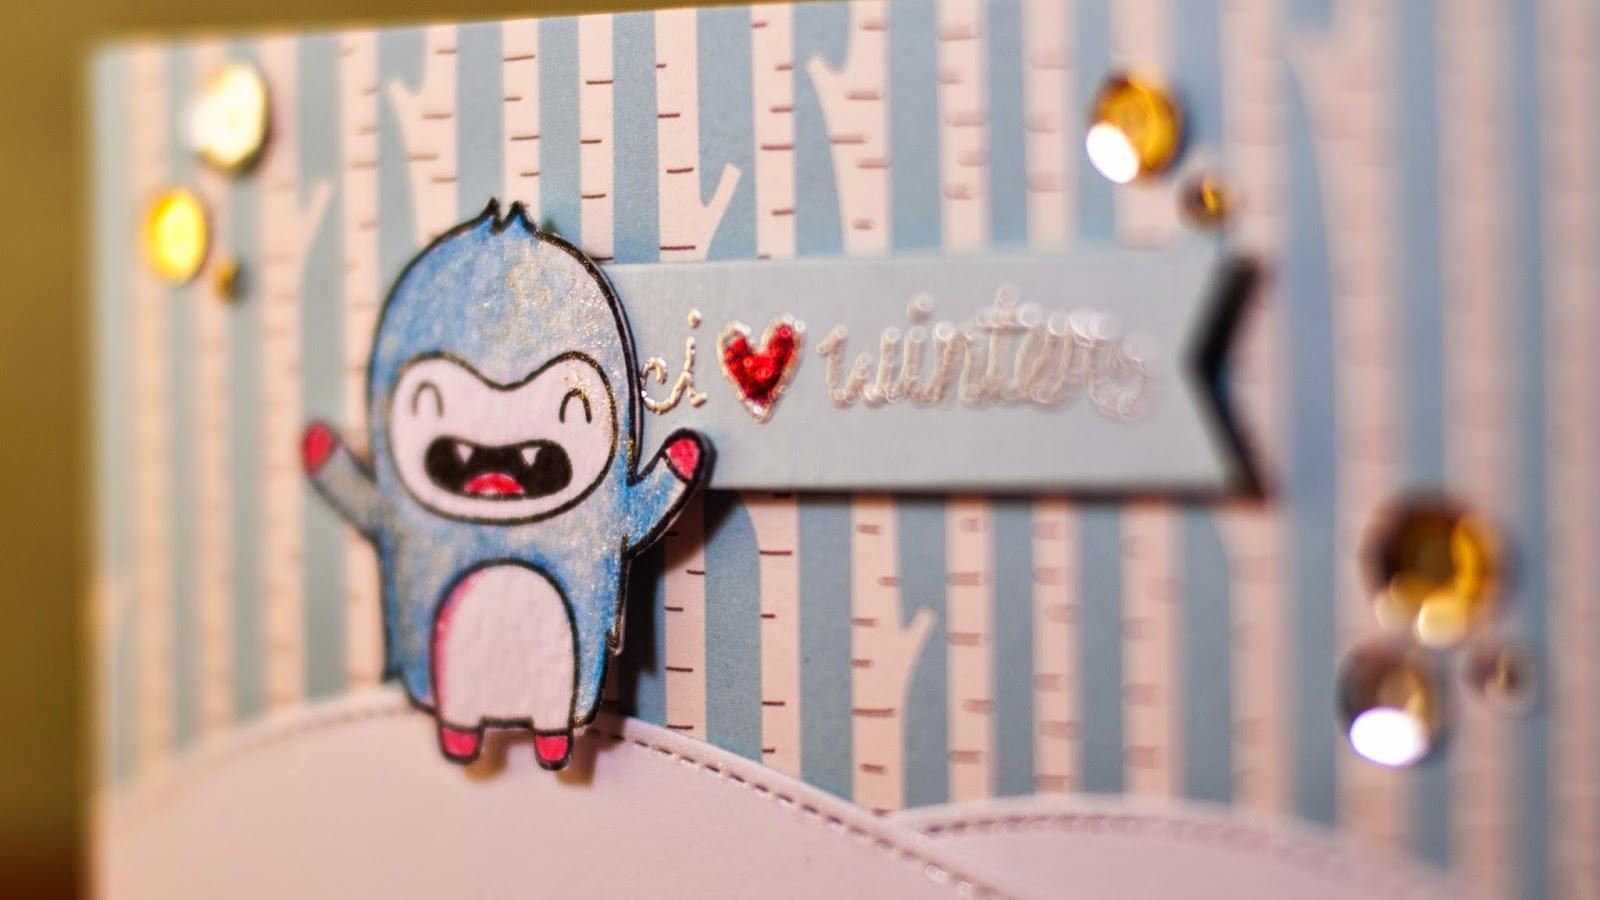 yeti loves winter - holiday card series - winter scnene